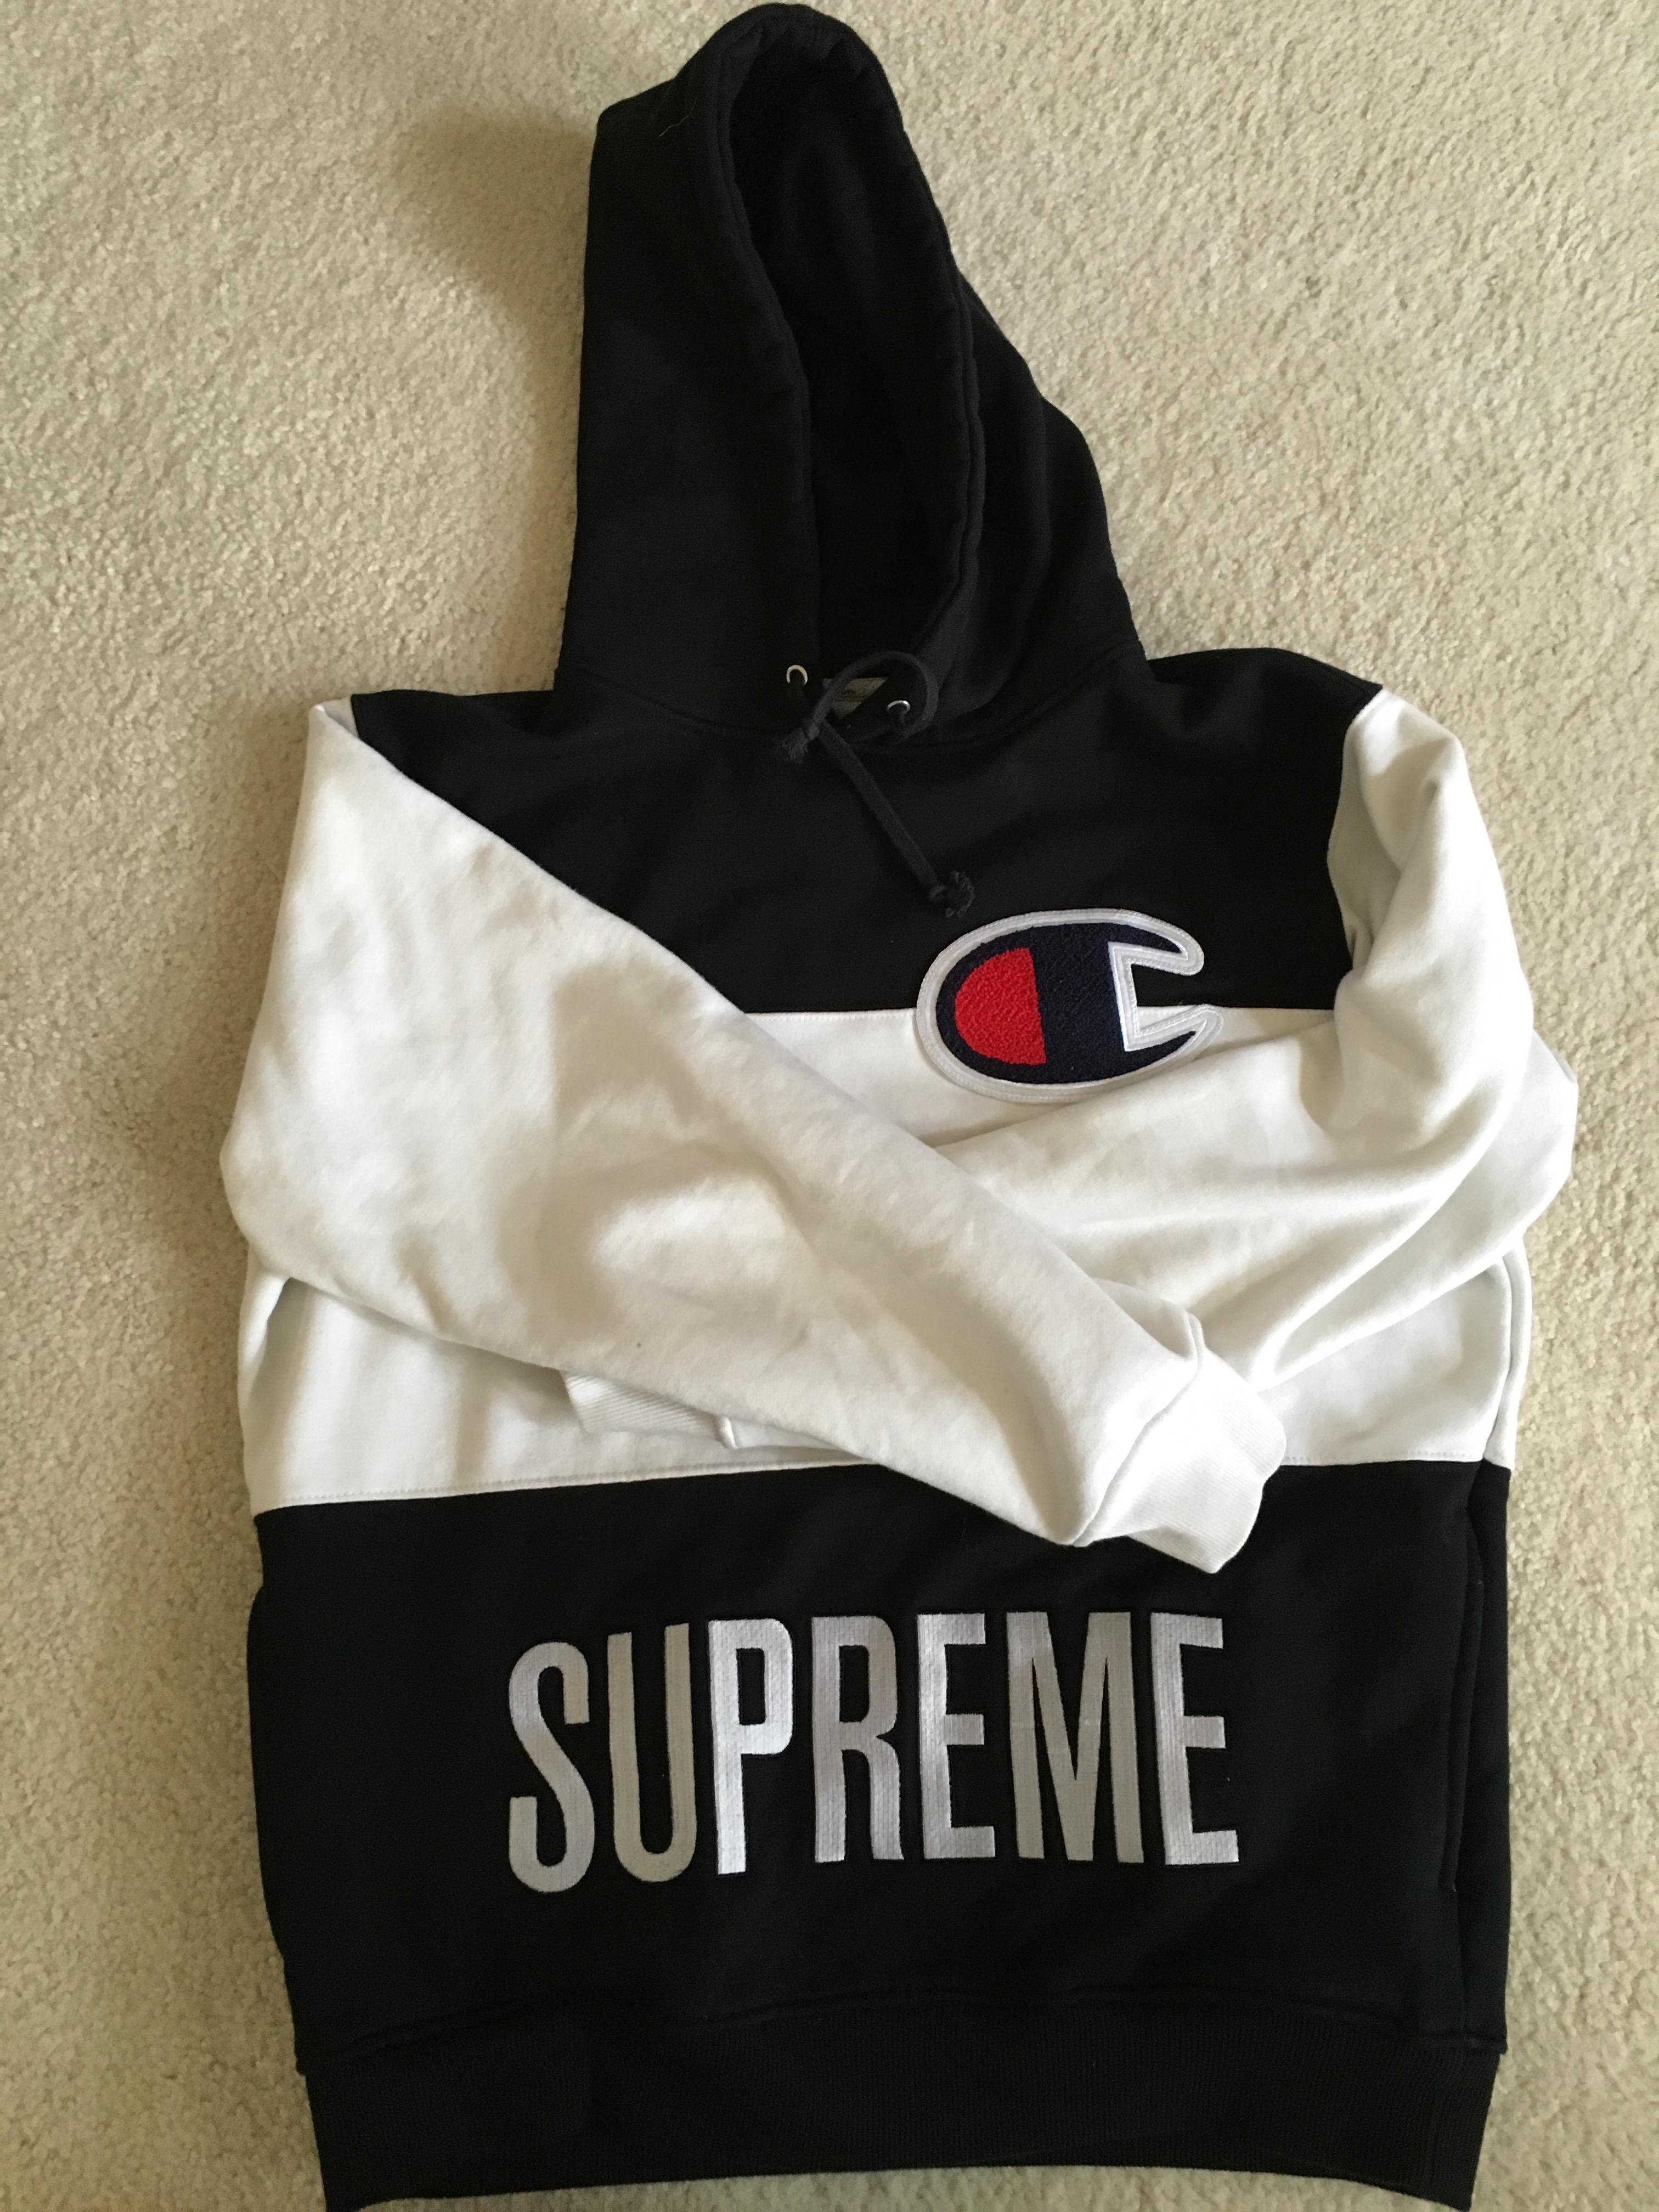 651195421eef Supreme Supreme x Champion Hoodie SS14 Size m - Sweatshirts   Hoodies for  Sale - Grailed